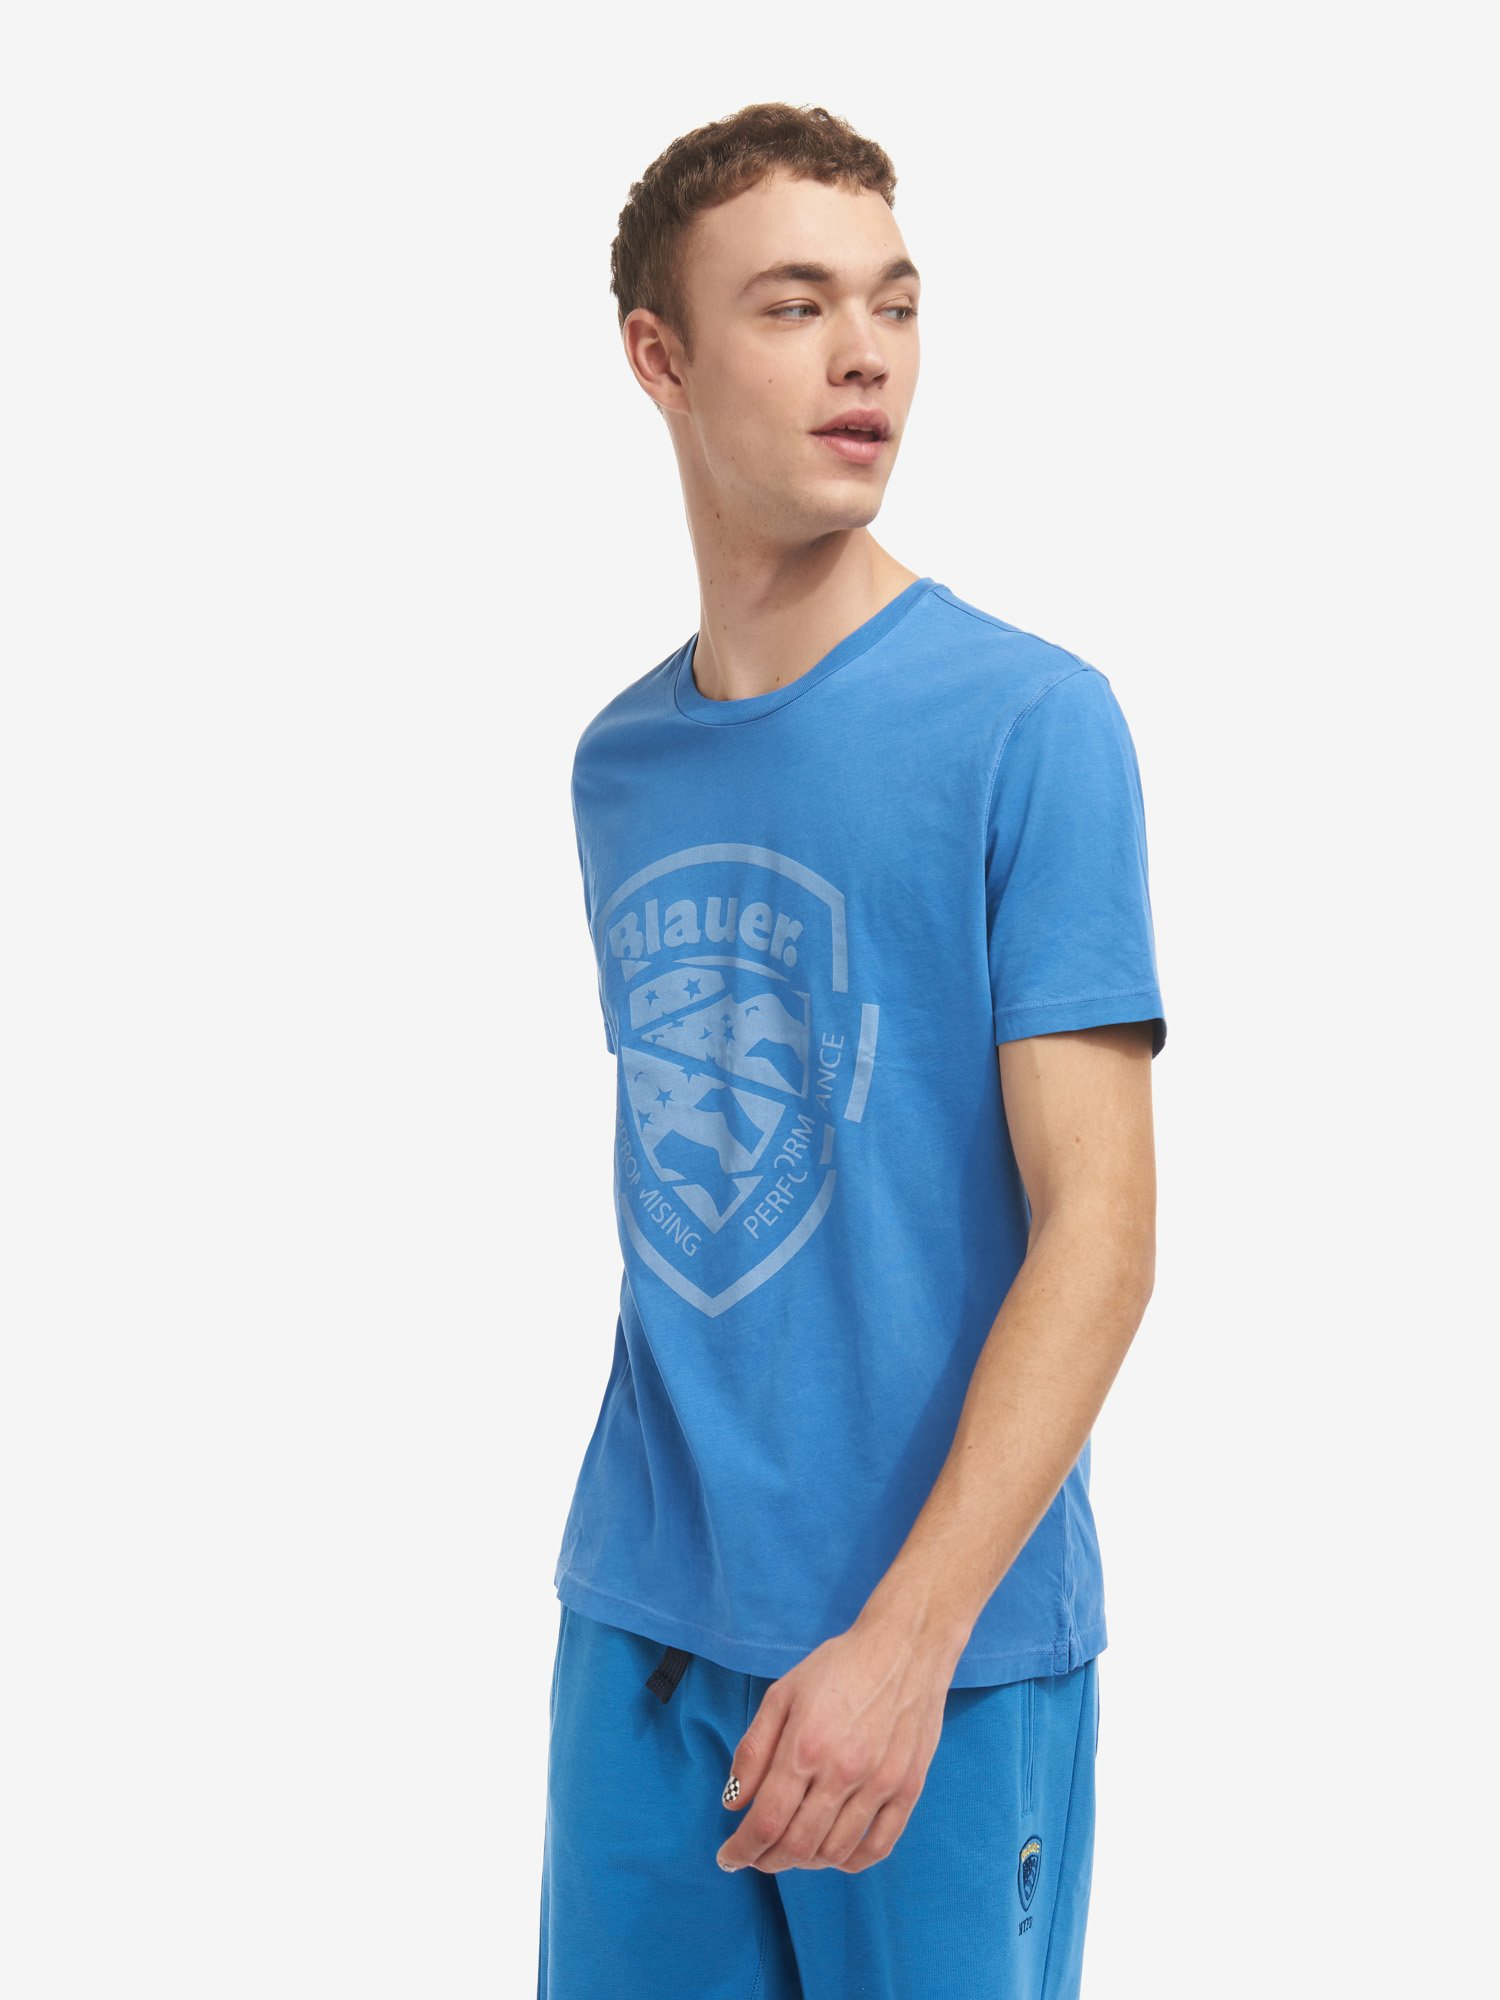 Blauer - CROPPED SHIELD T-SHIRT - Light Sapphire Blue - Blauer